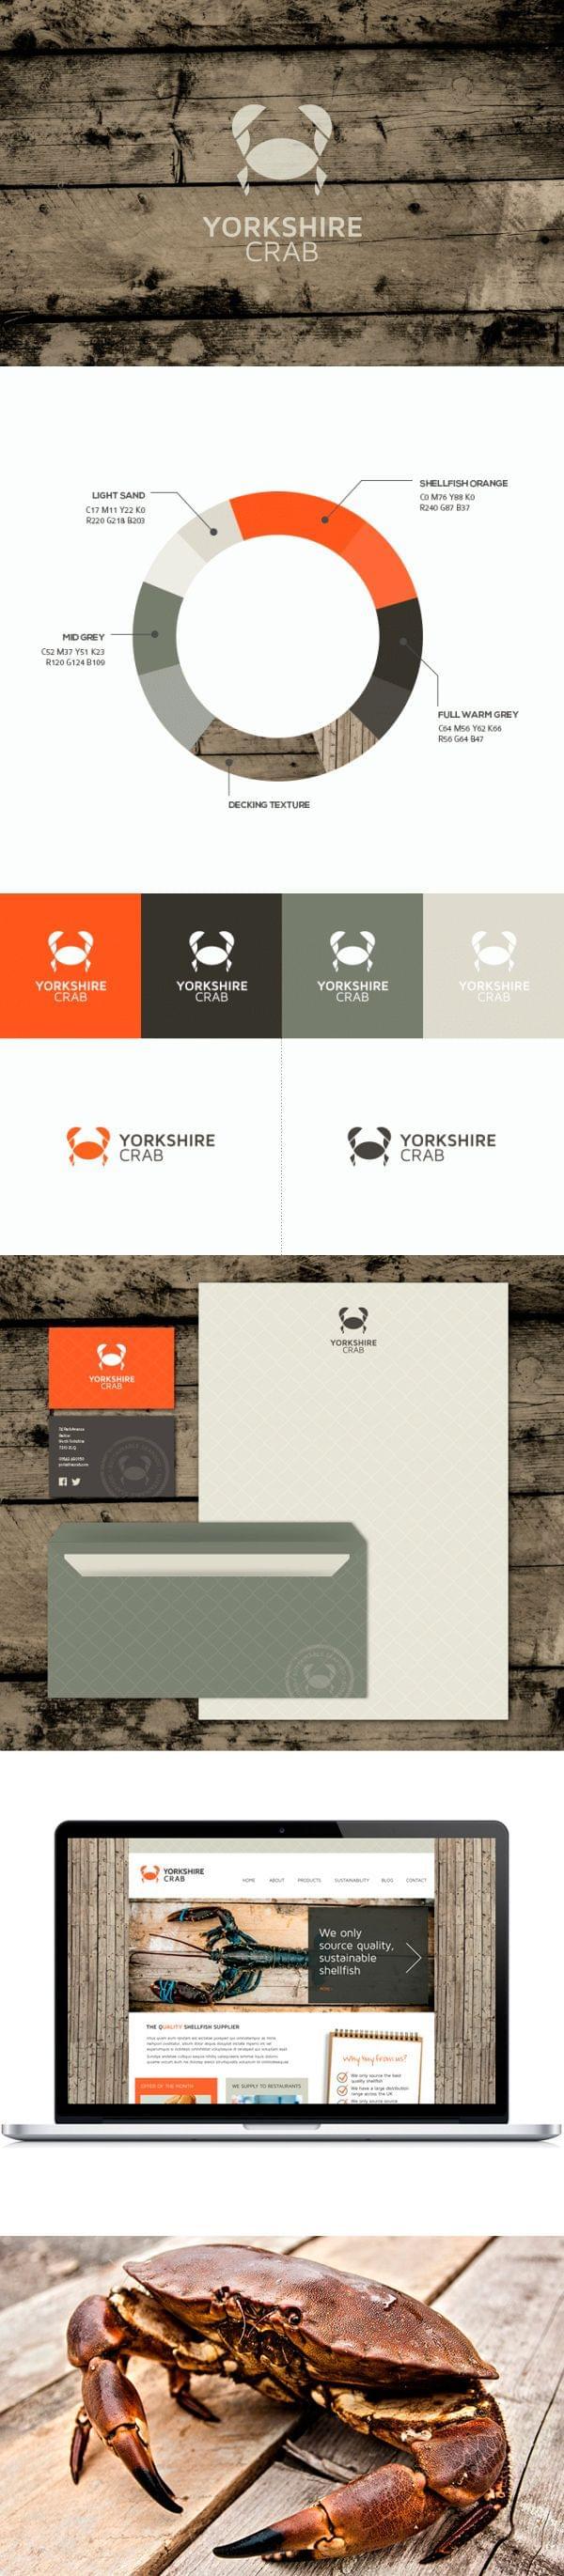 Yorkshire Crab – Visual Identity